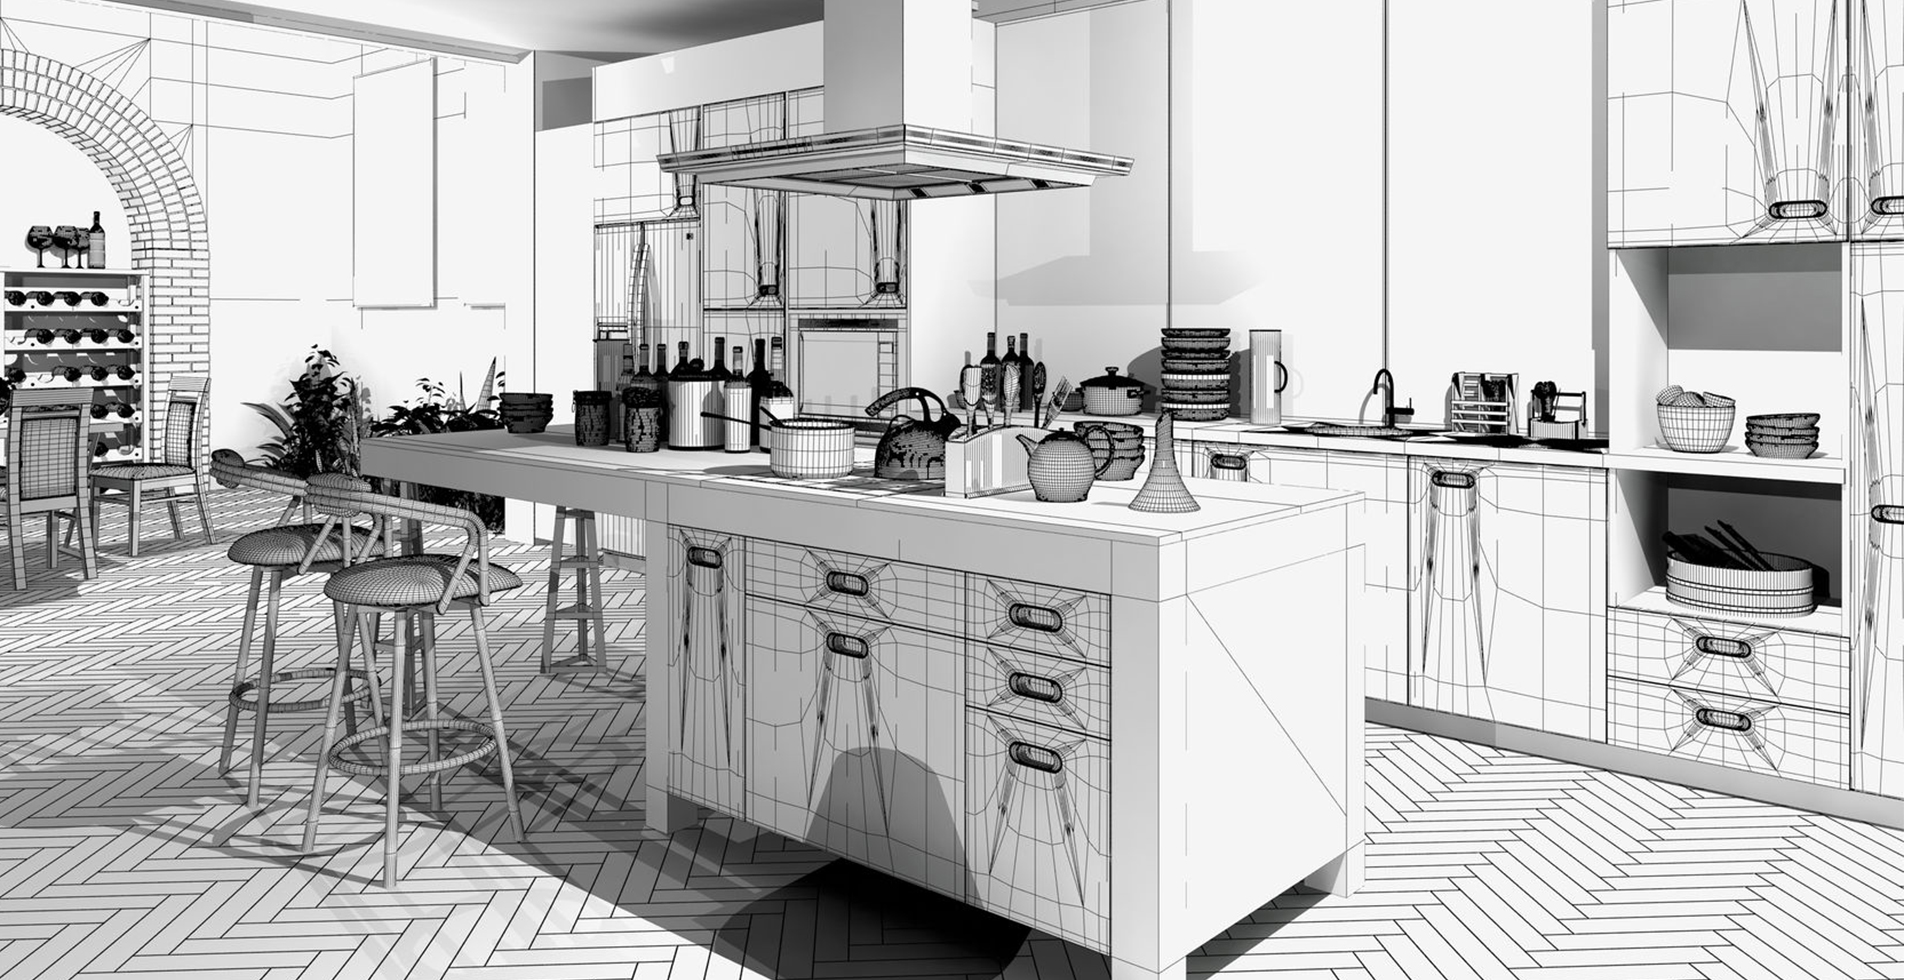 küche in wireframe